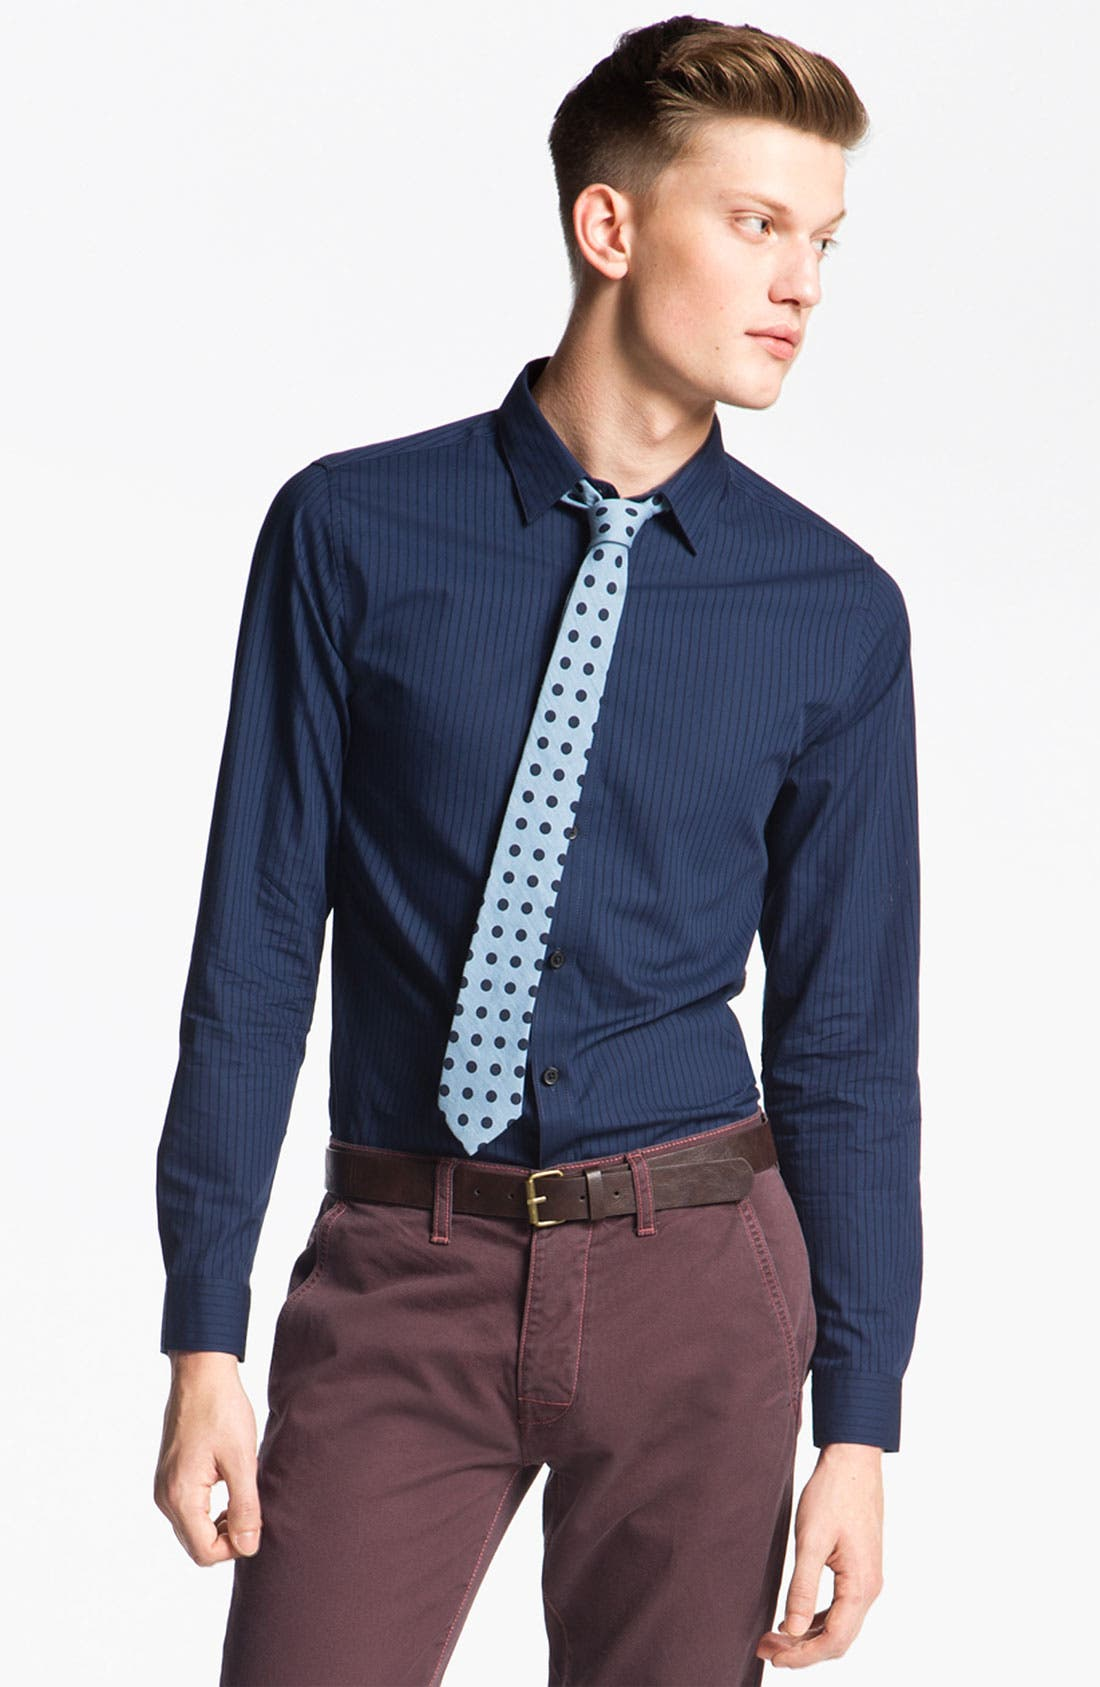 Alternate Image 1 Selected - Topman 'Smart' Extra Trim Dress Shirt